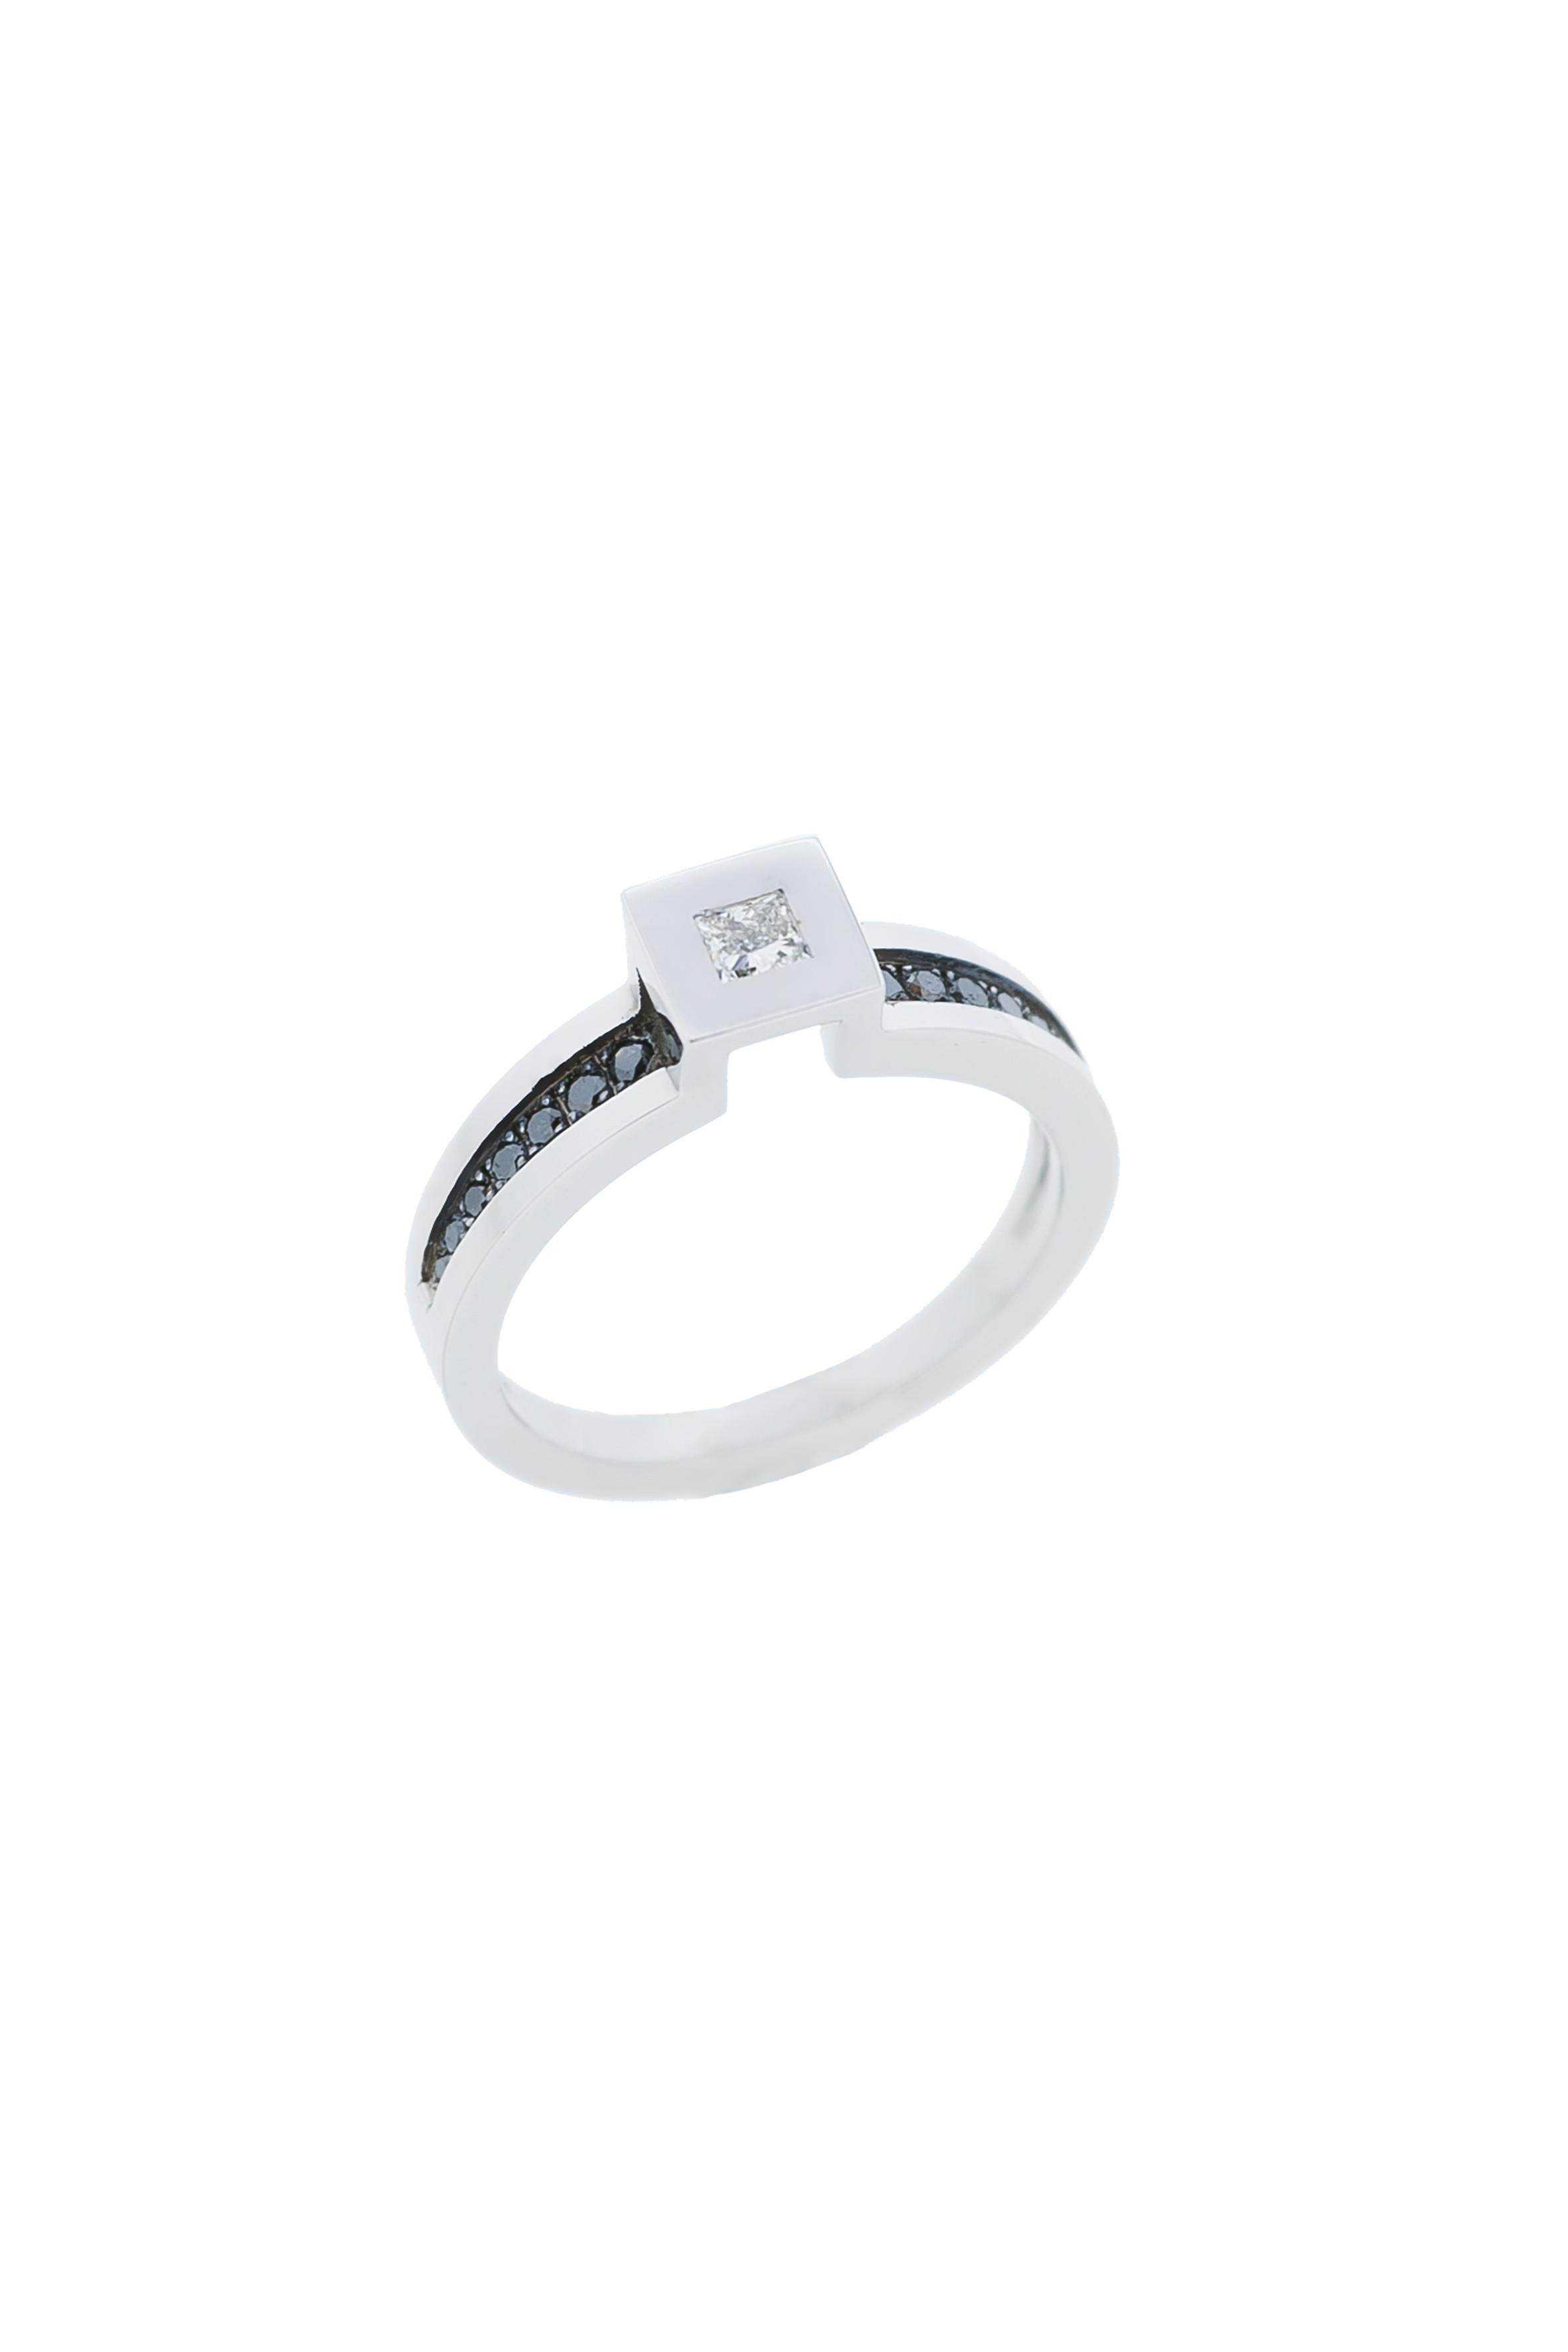 bague or blanc plusieurs anneaux